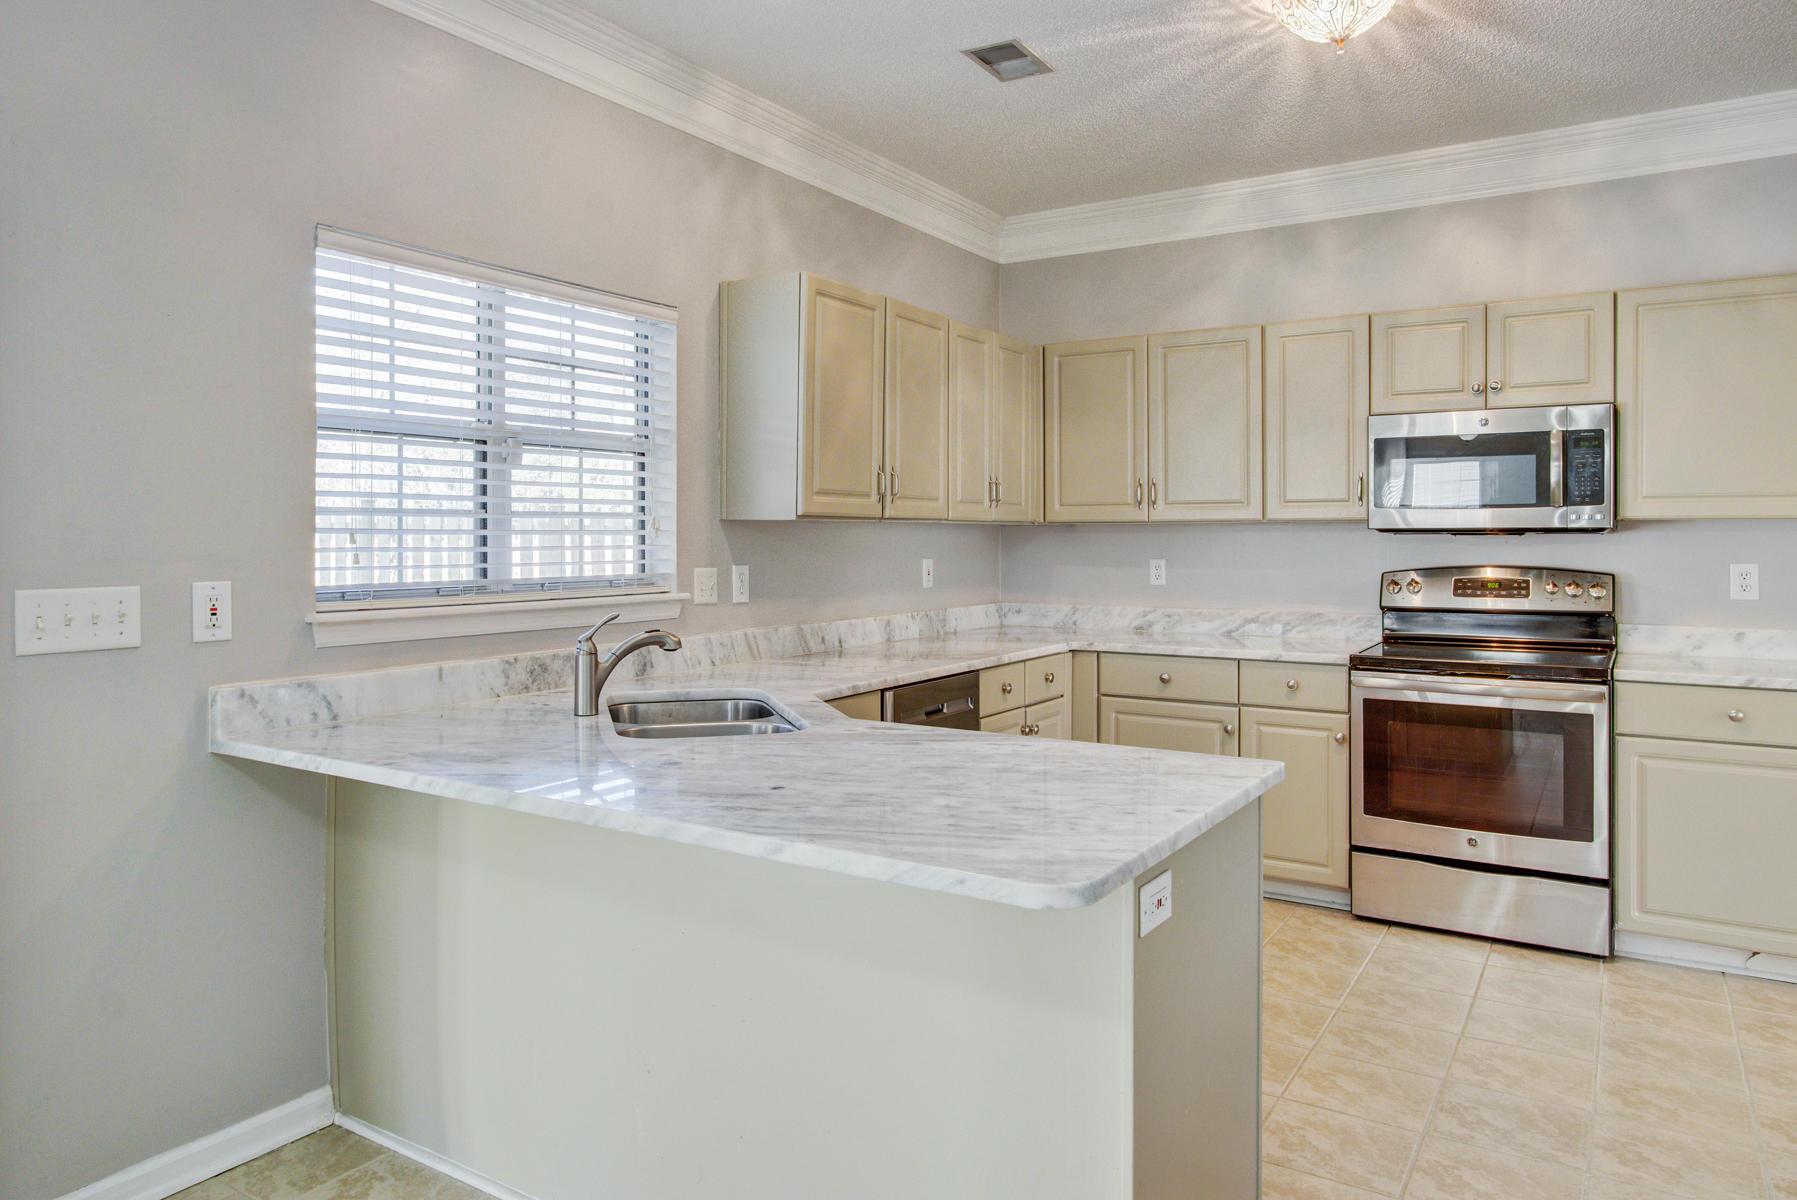 Village Green Homes For Sale - 3323 Hearthside, Charleston, SC - 0